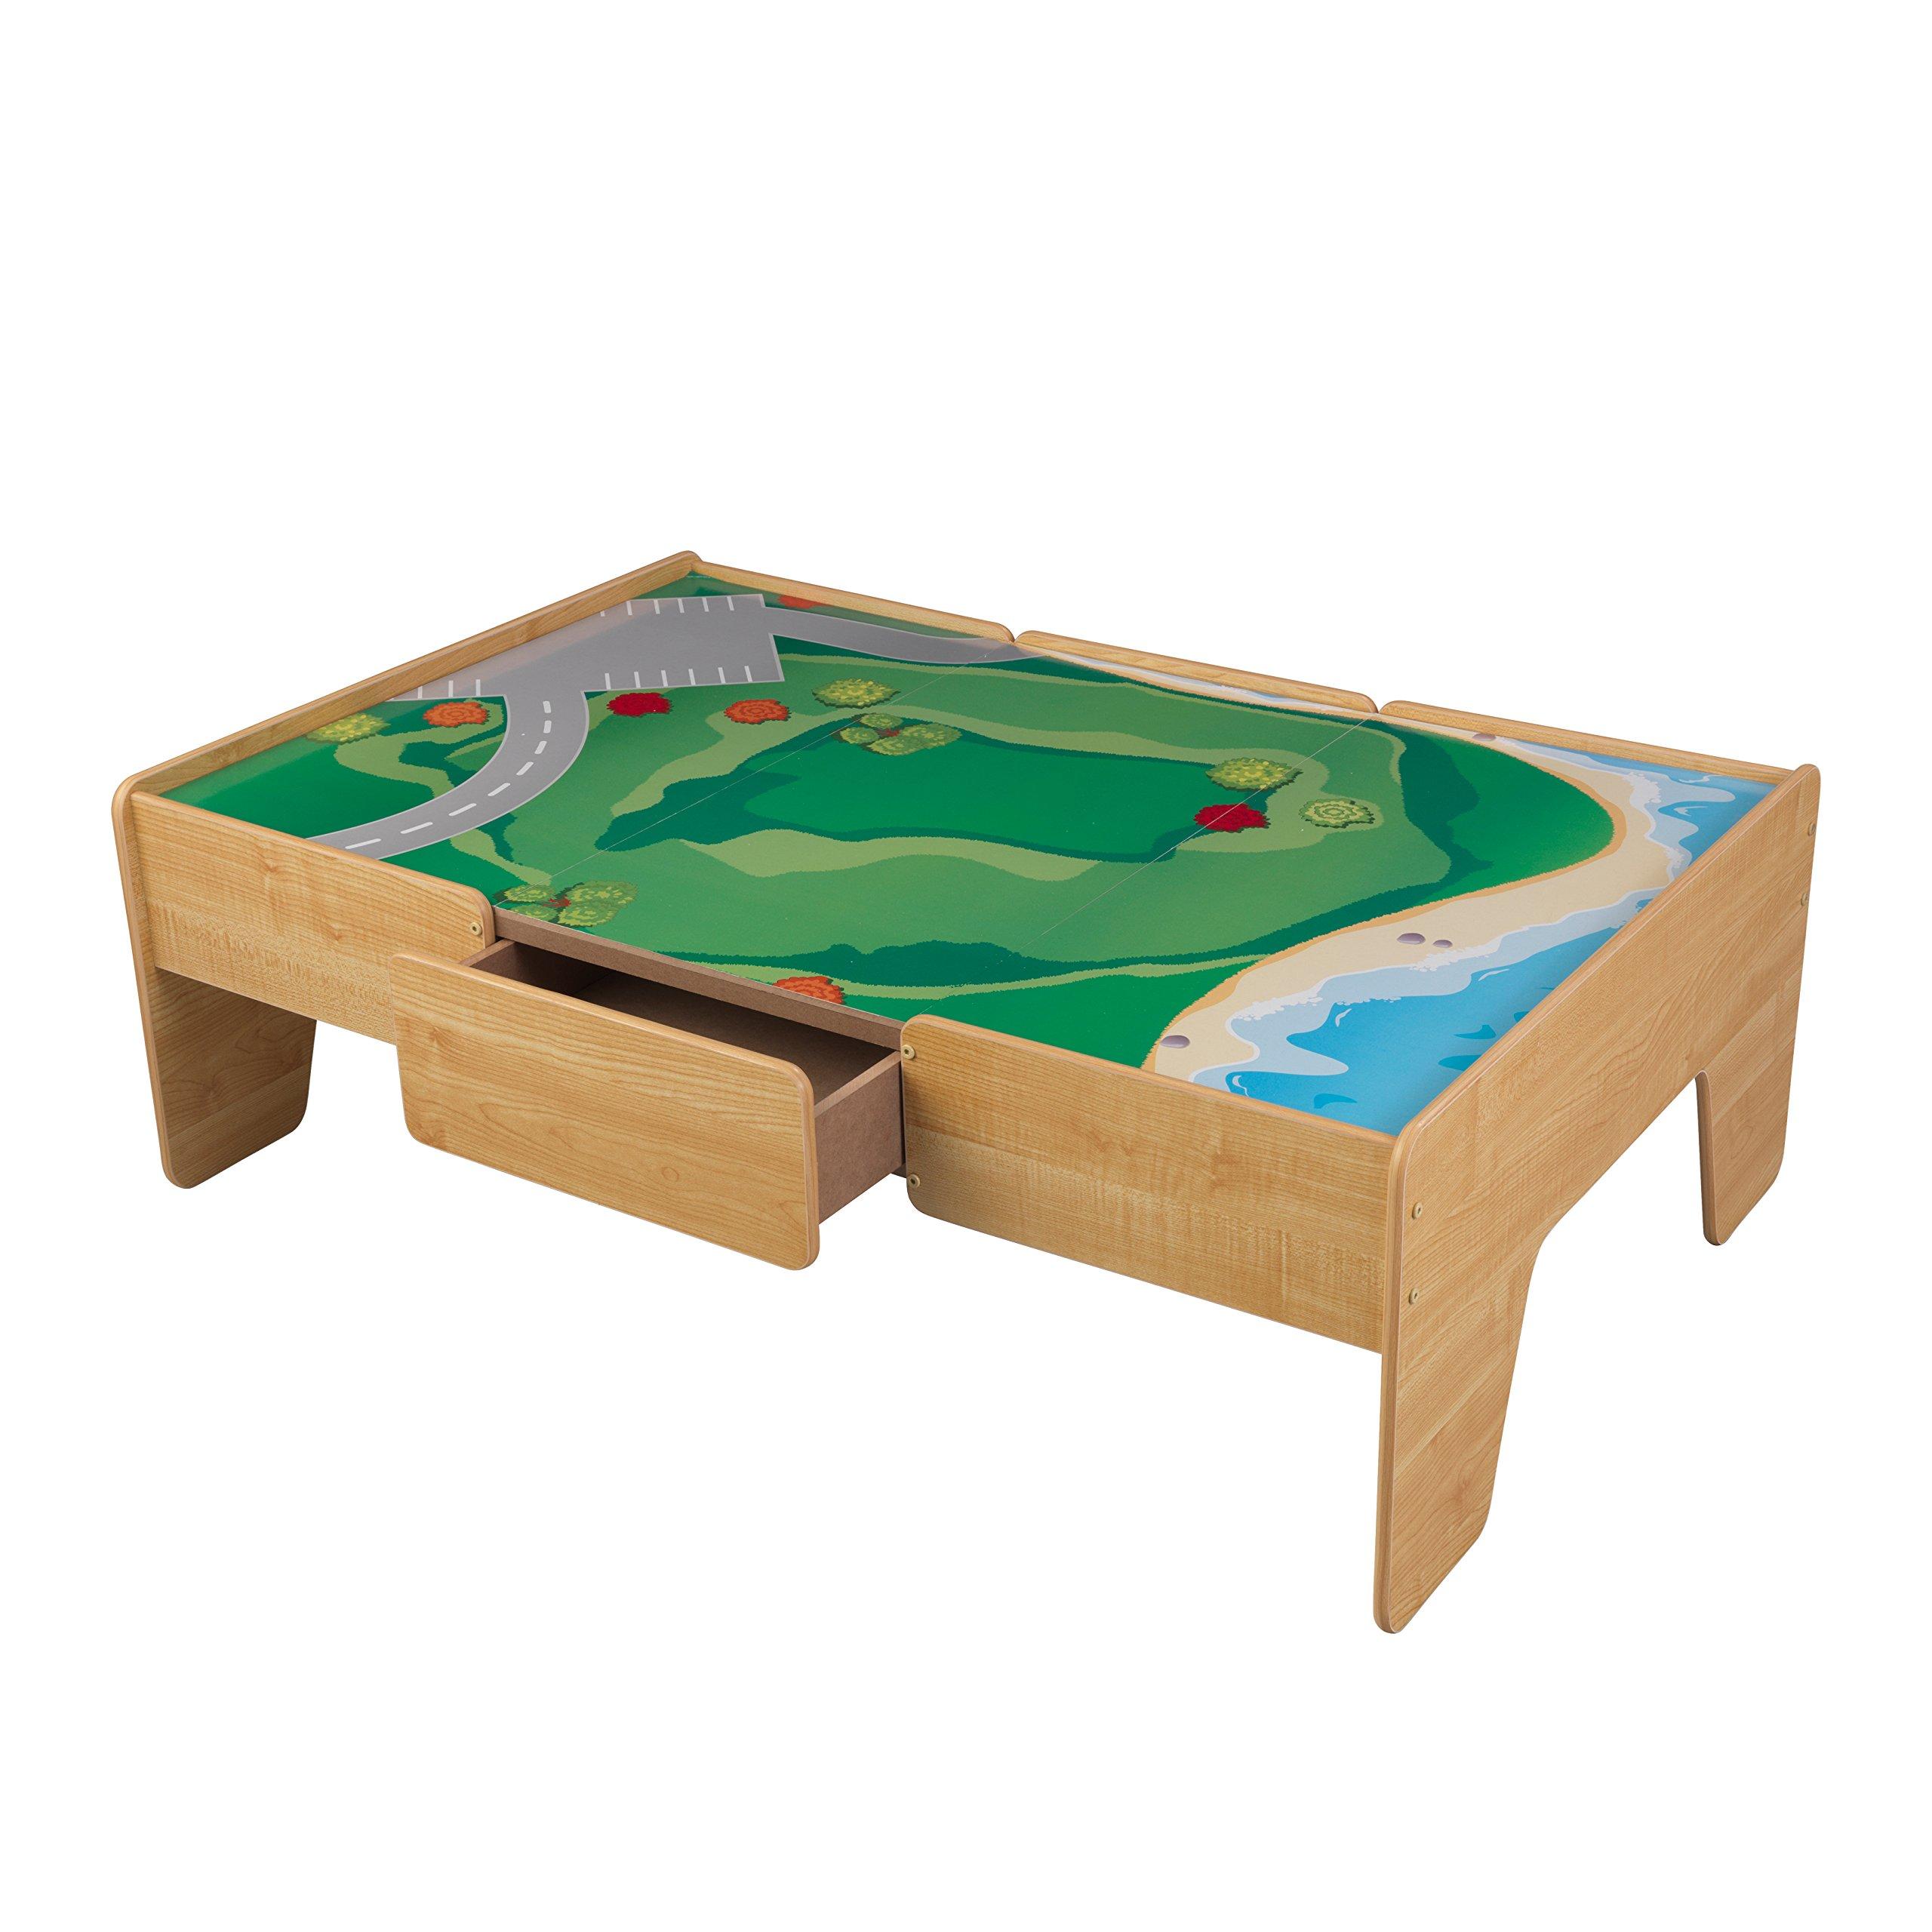 KidKraft Wooden Play Table Train Table by KidKraft